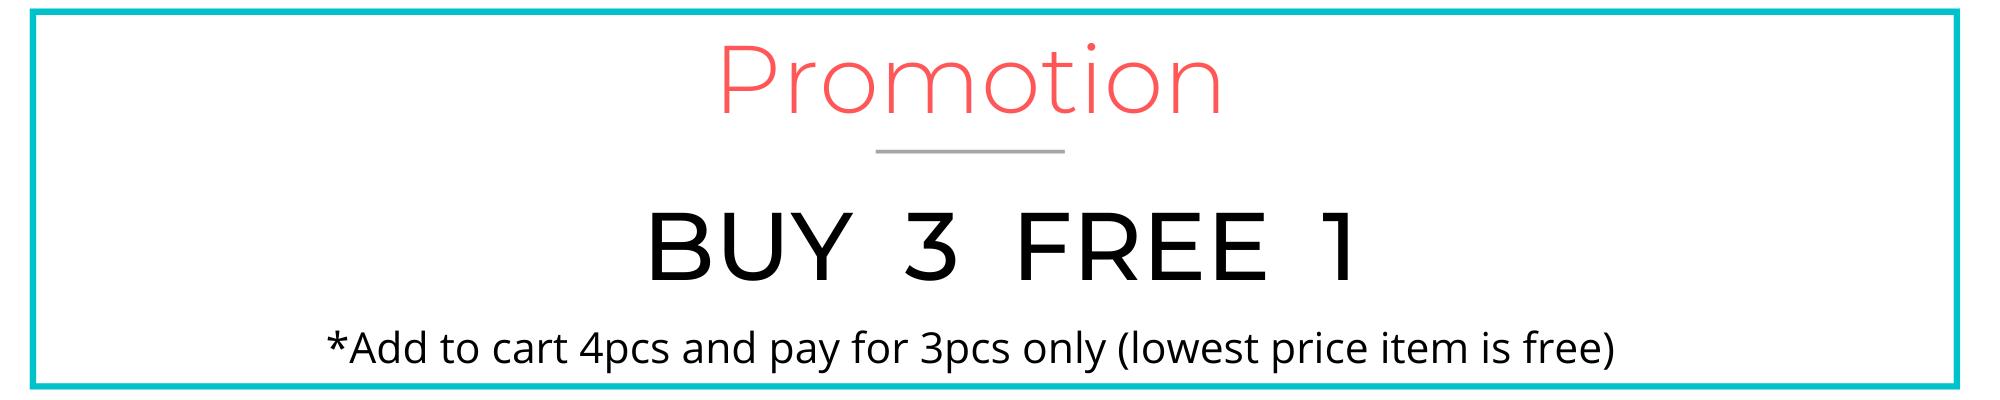 Buy 3 Free 1 Banner